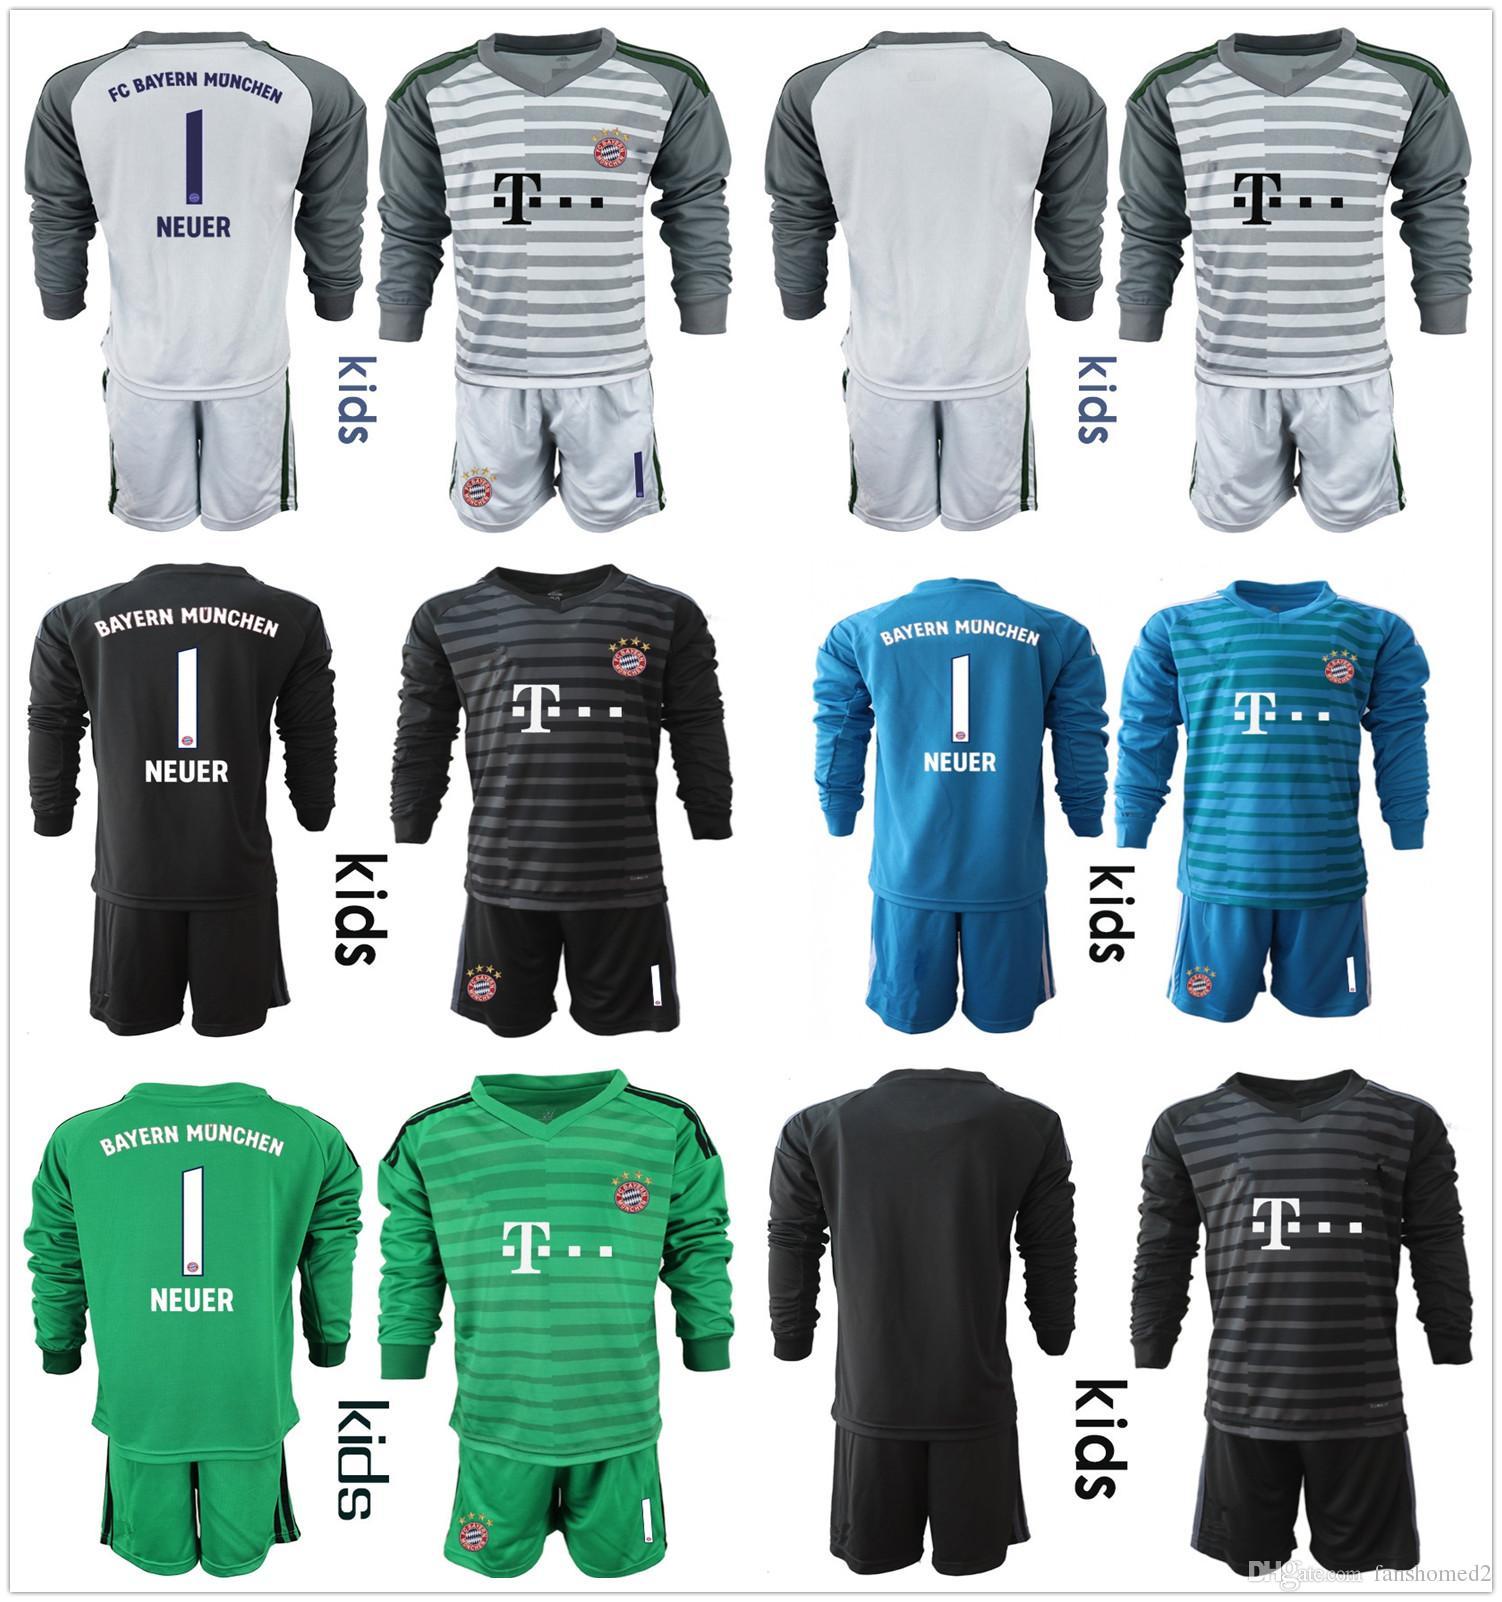 ... Portero Kit Conjuntos De Fútbol Juvenil   1 Manuel Neuer   26 Ulreich  Hoffmann Kits De Fútbol Uniforme Completo KID A  20.26 Del Fanshomed2  a65fbaf7a151b